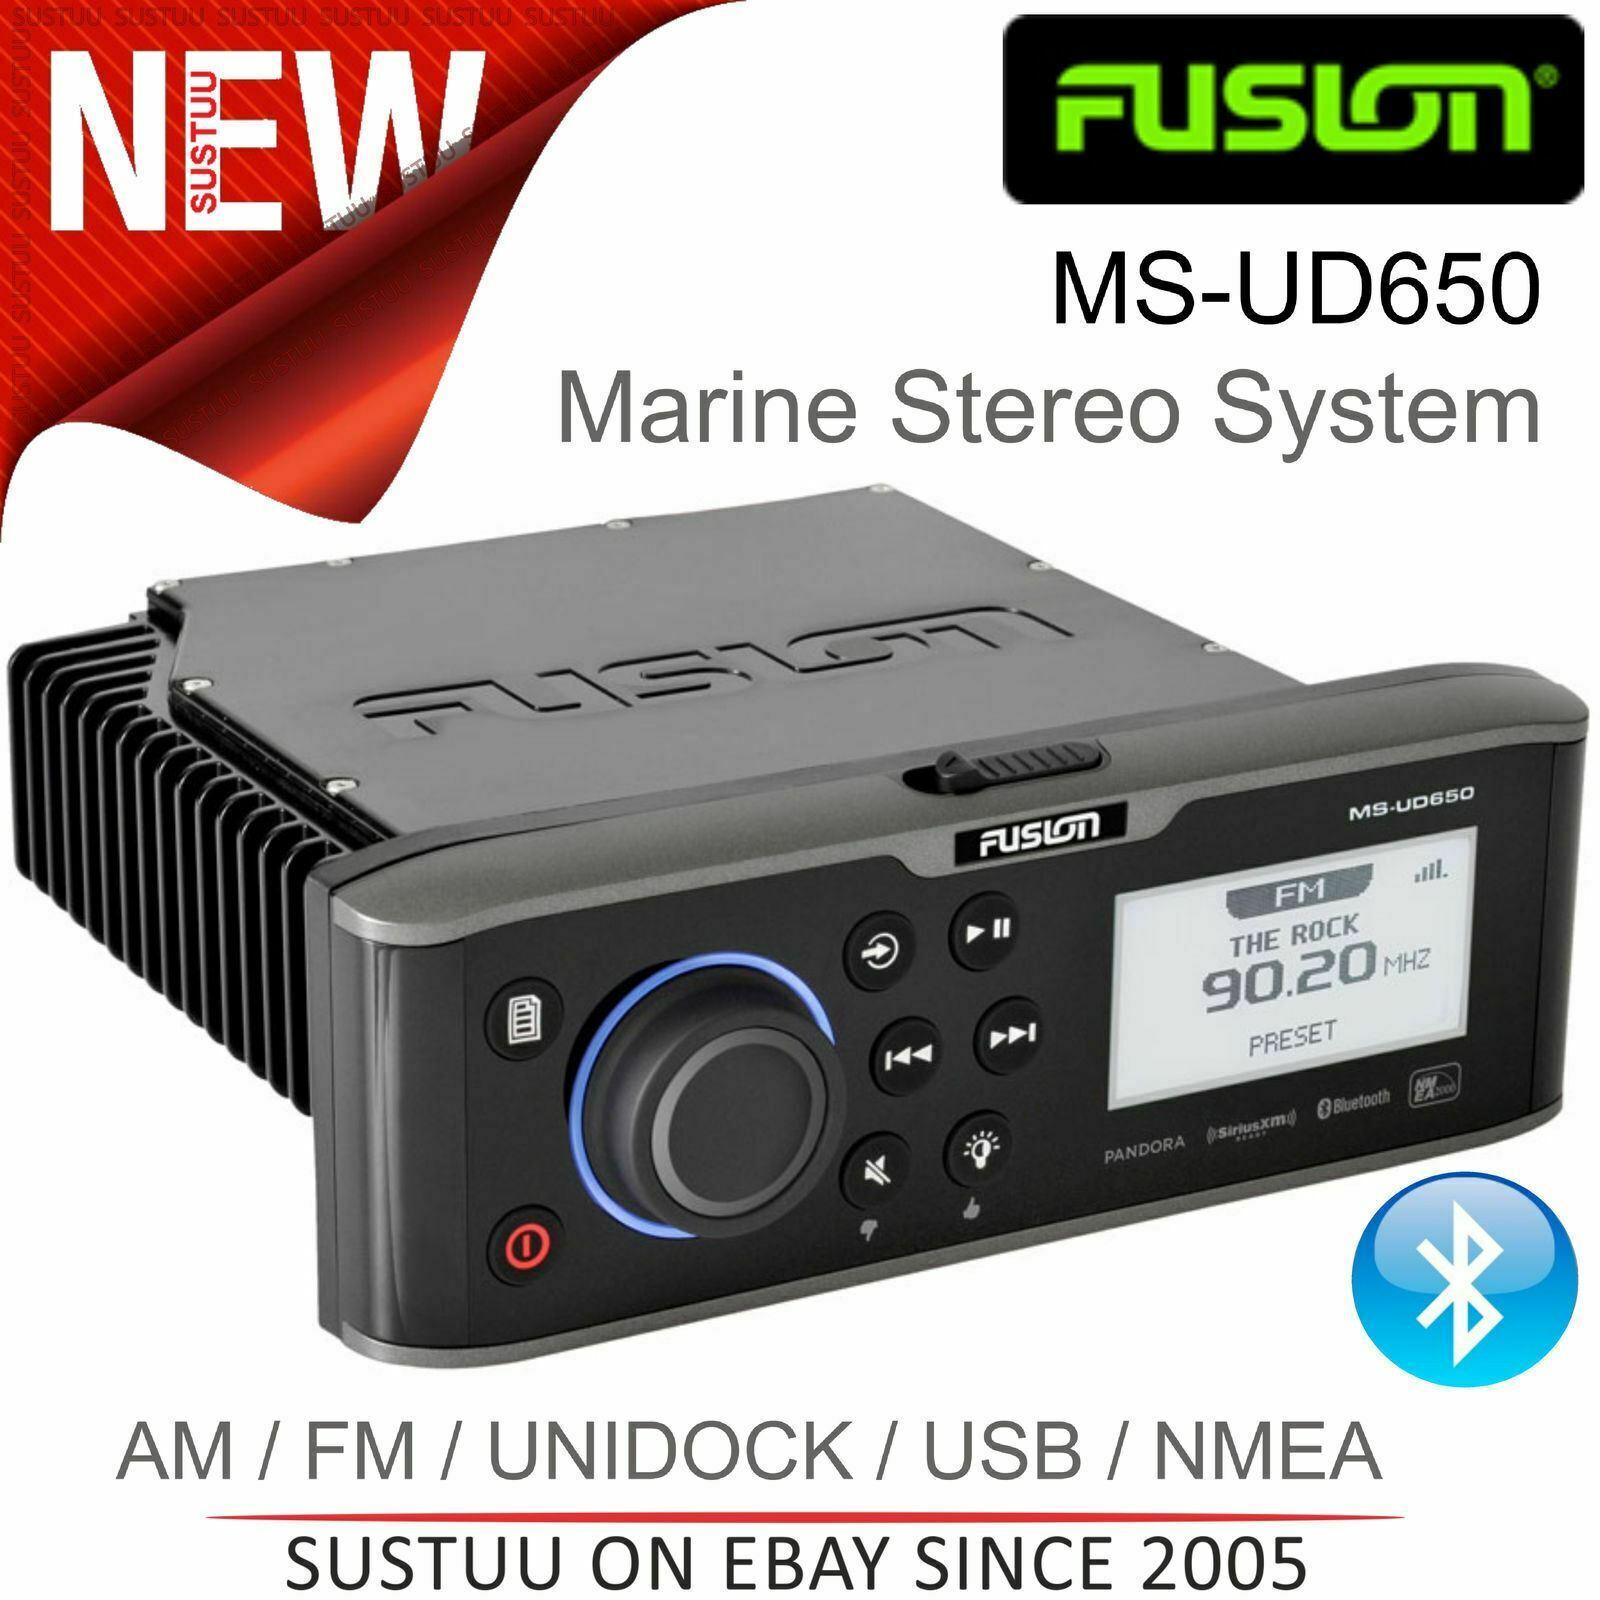 Fusion MS-UD650 Marine Stereo │ Am Fm   Unidock   BT   USB Aux   Nmea   Mtp │